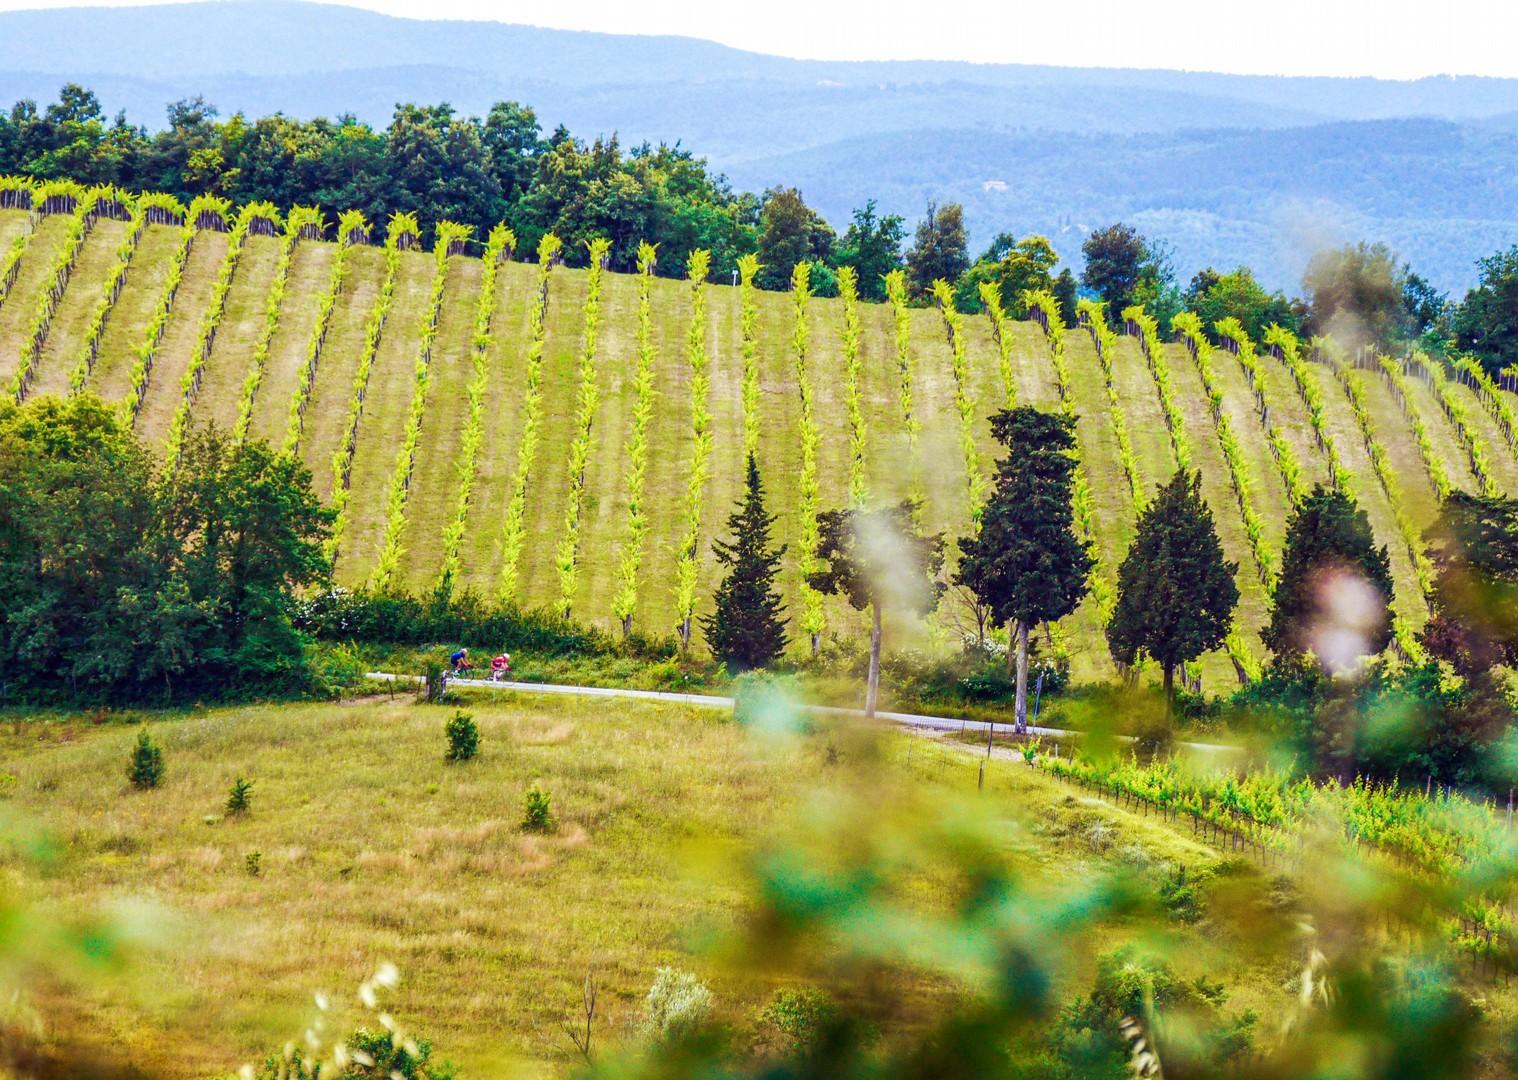 Riding through the vineyards.jpg - Italy - Tuscany - Giro della Toscana - Guided Road Cycling Holiday - Road Cycling